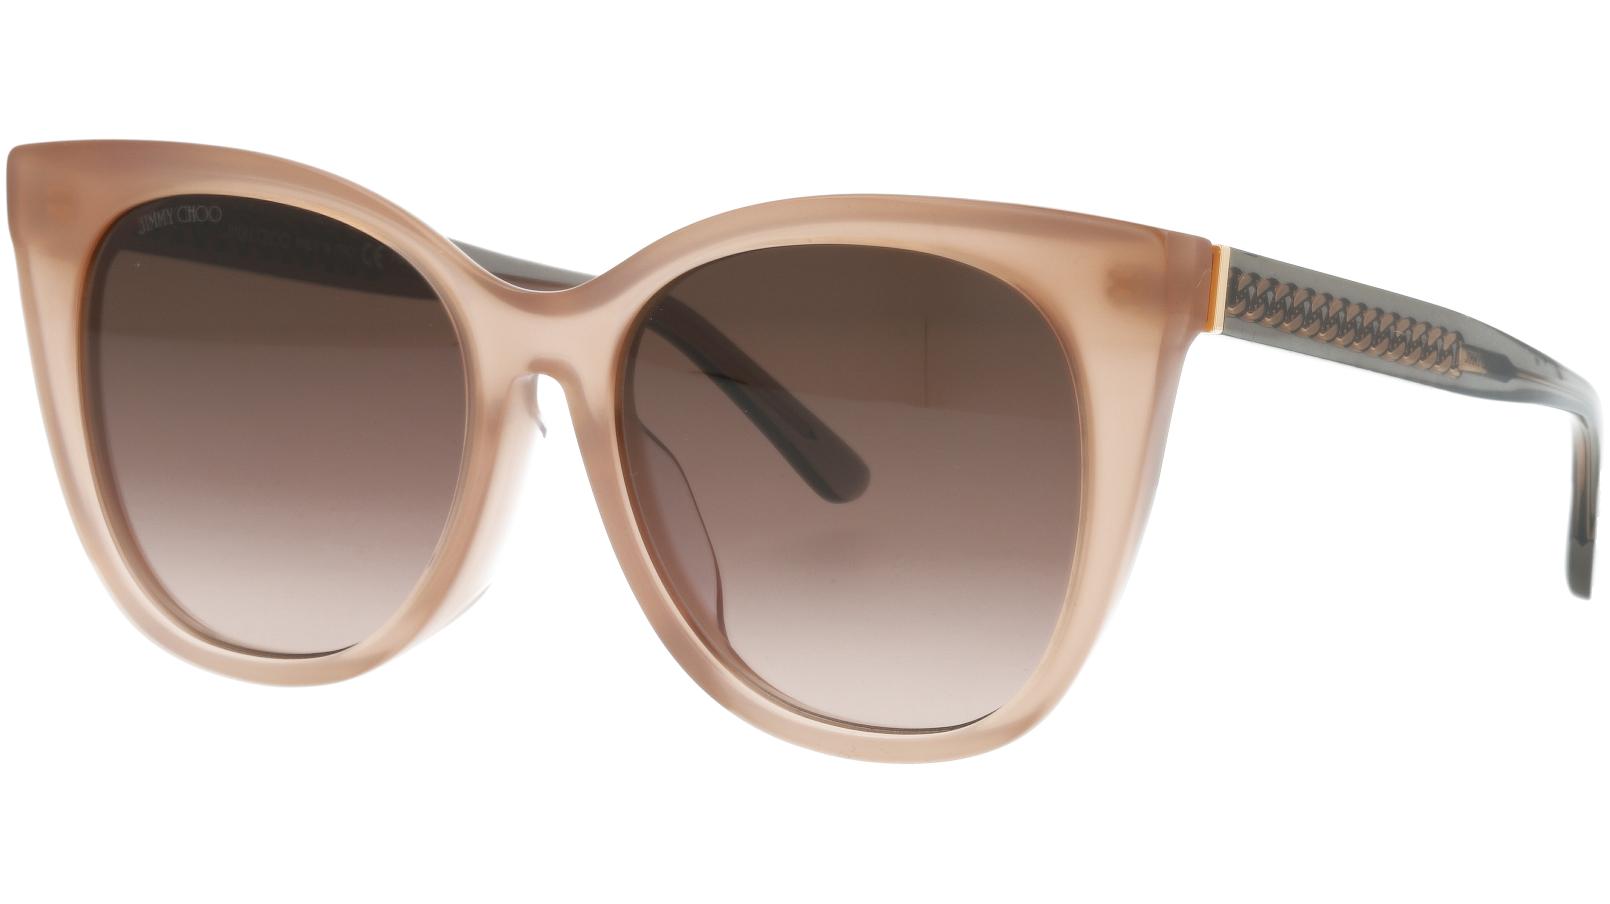 JIMMY CHOO ALENA/F/S FWMHA 54 NUDE Sunglasses